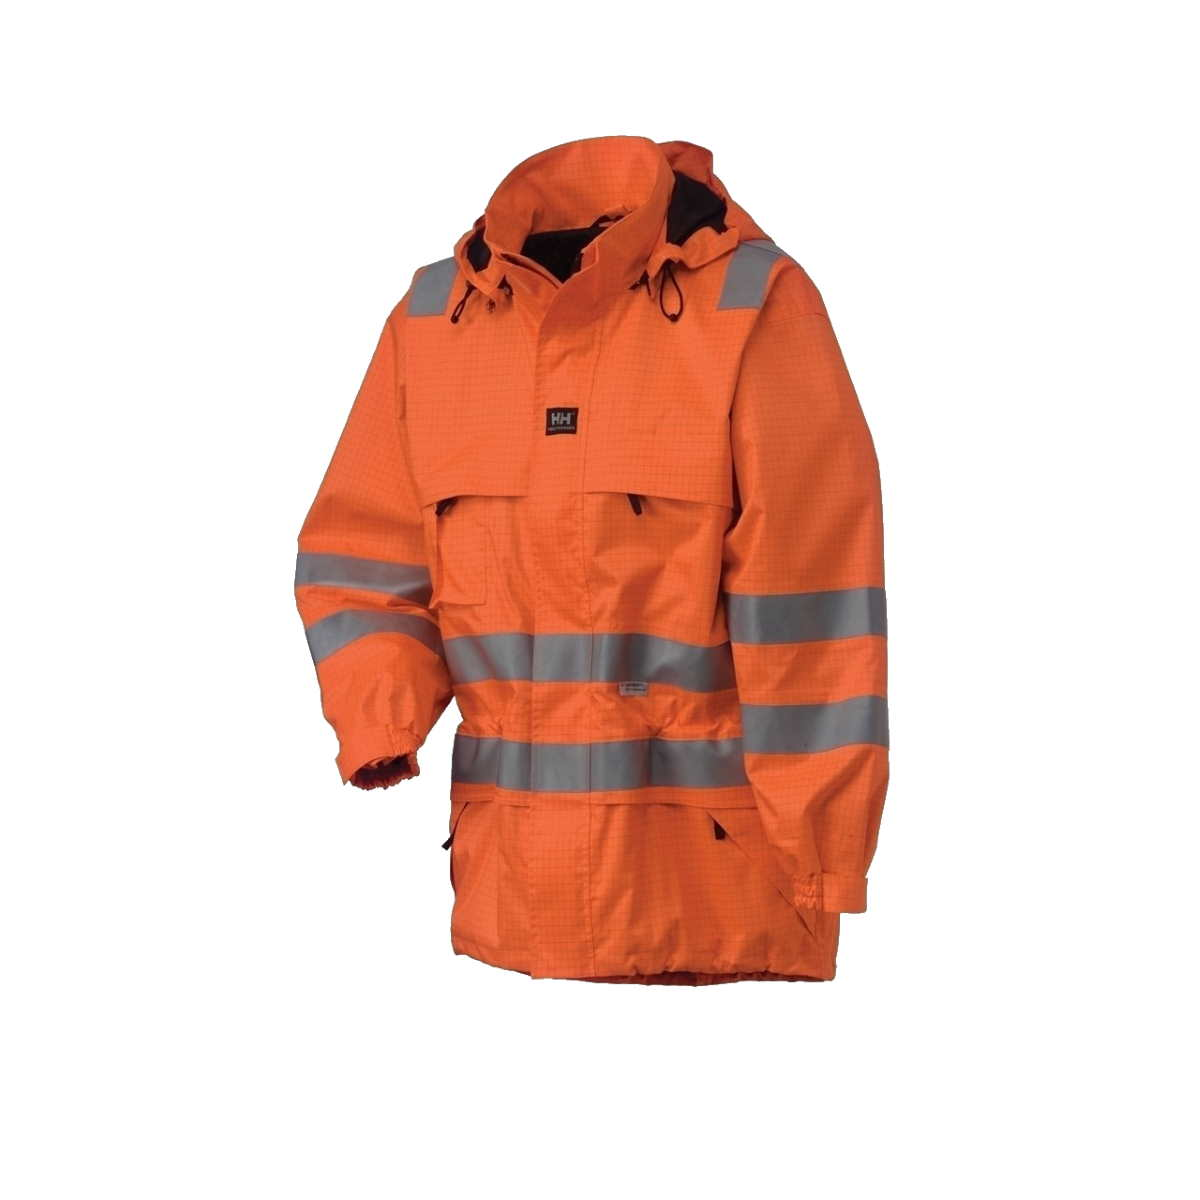 AS1010 Helly Hansen Rothenburg FR AS Jacket Orange